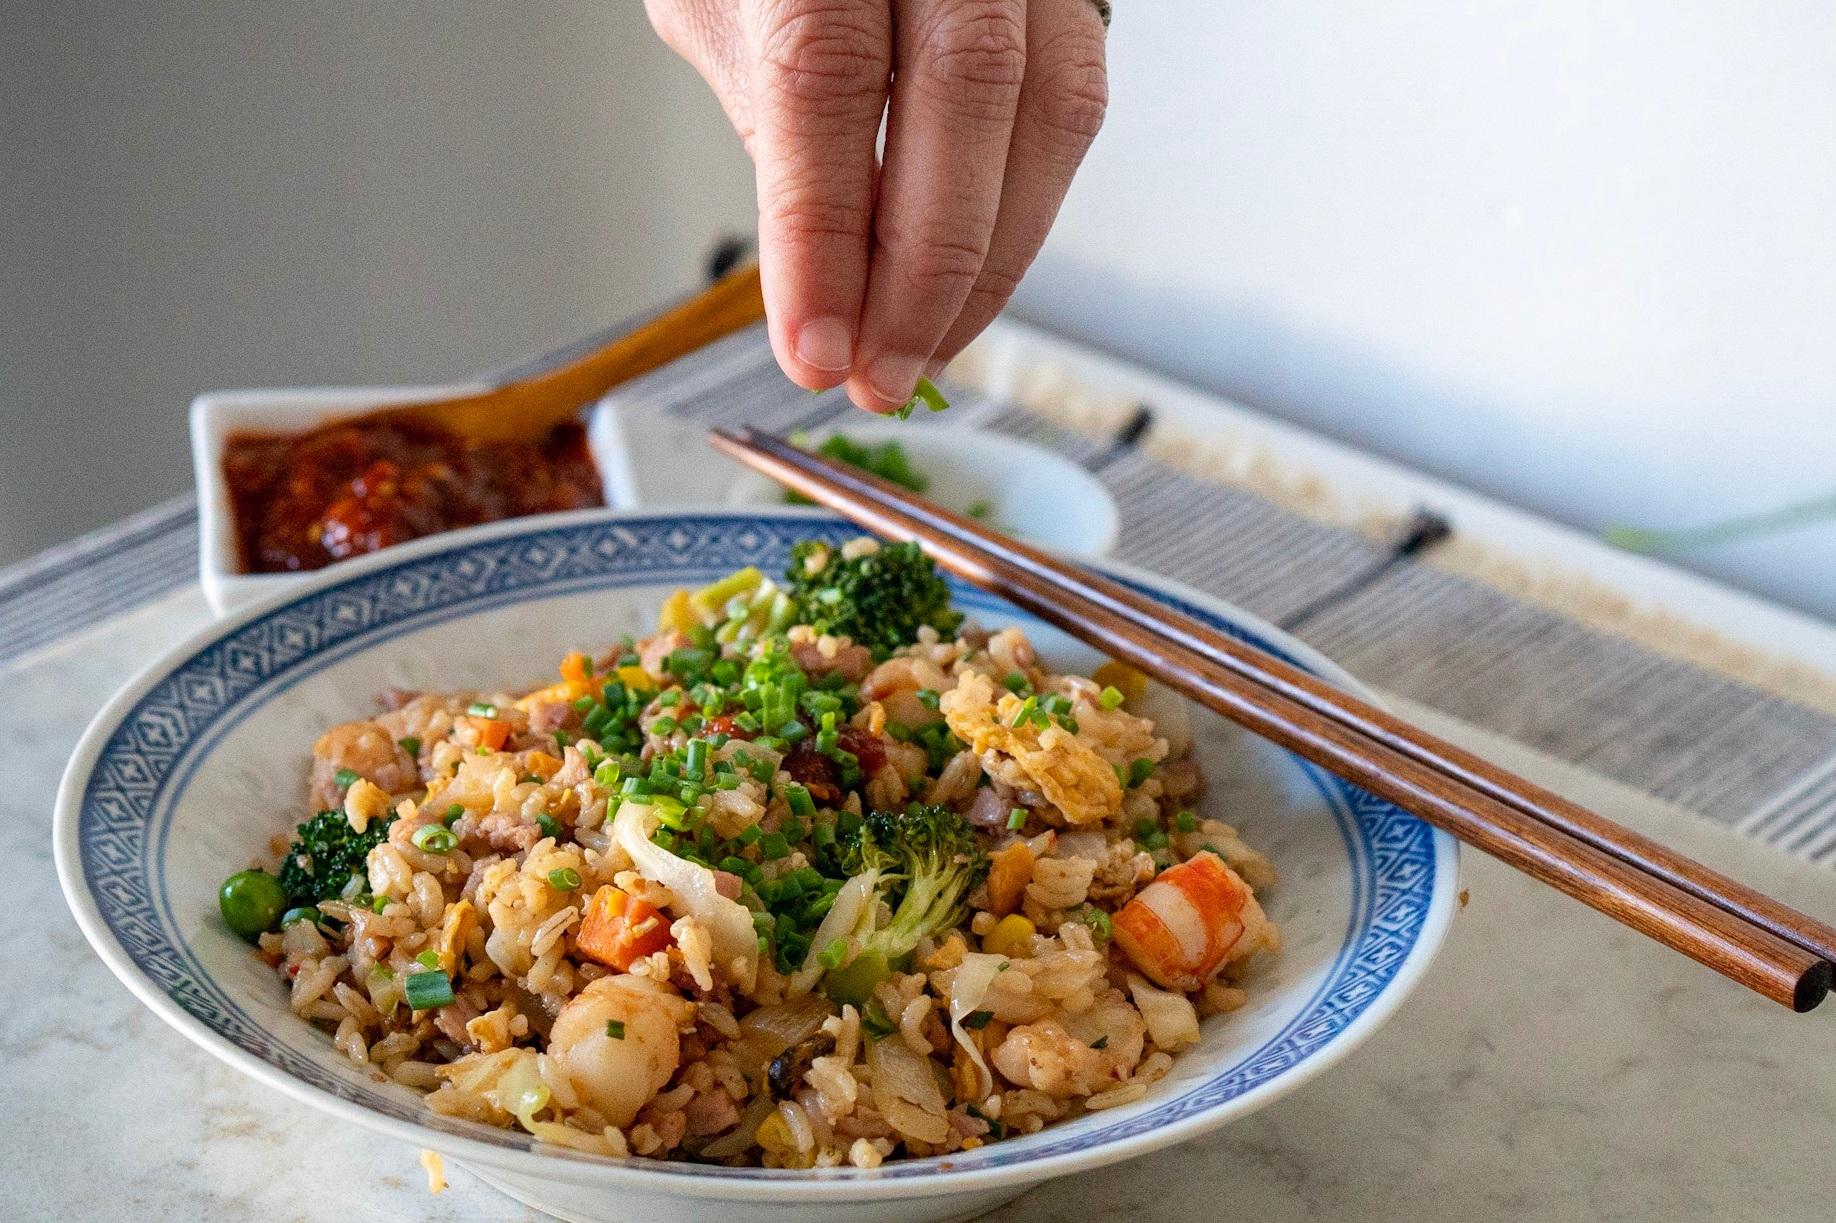 garnish your rice with plenty of scallion greens